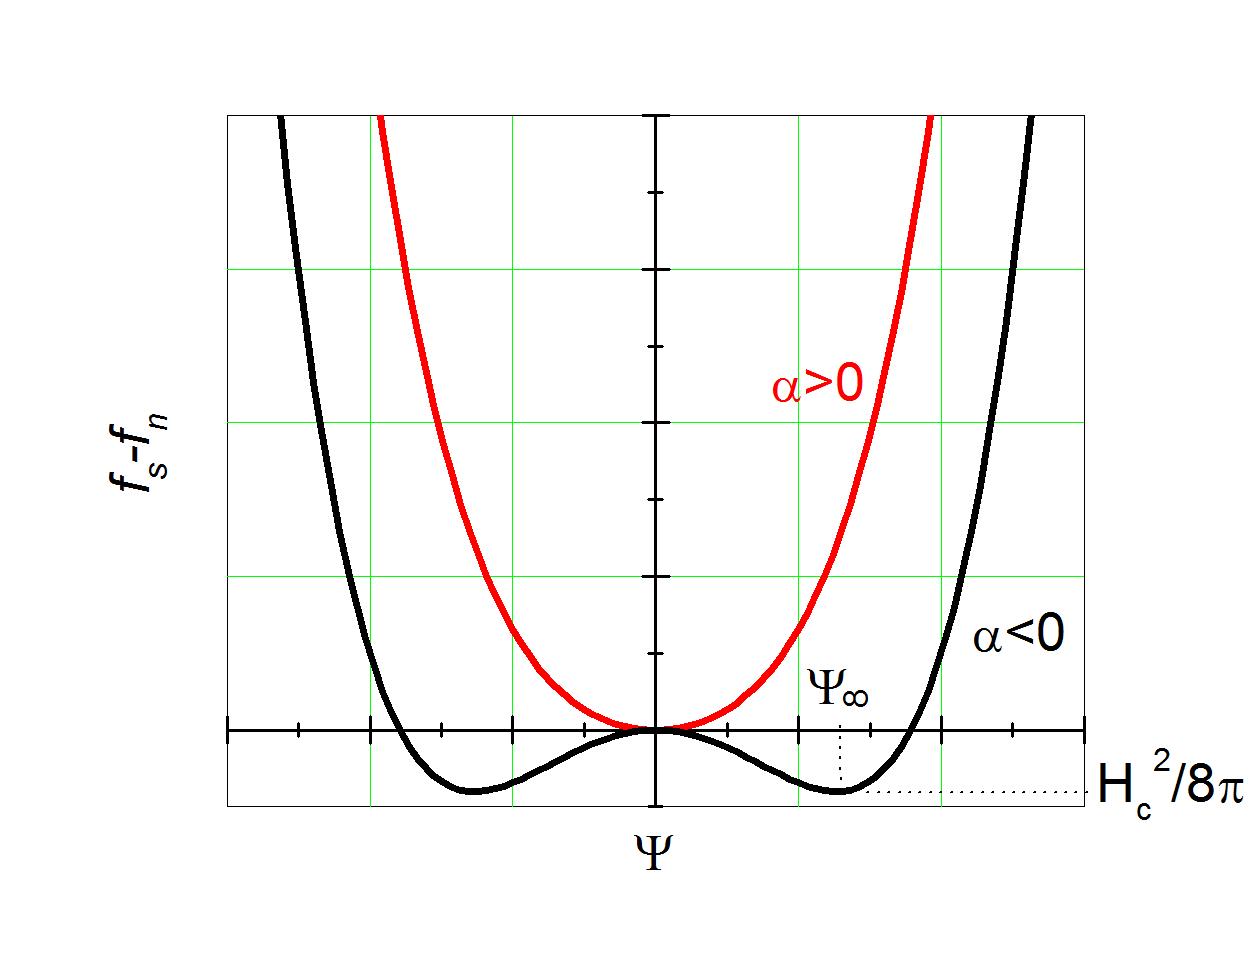 Numerical Analysis of Variational Inequalities